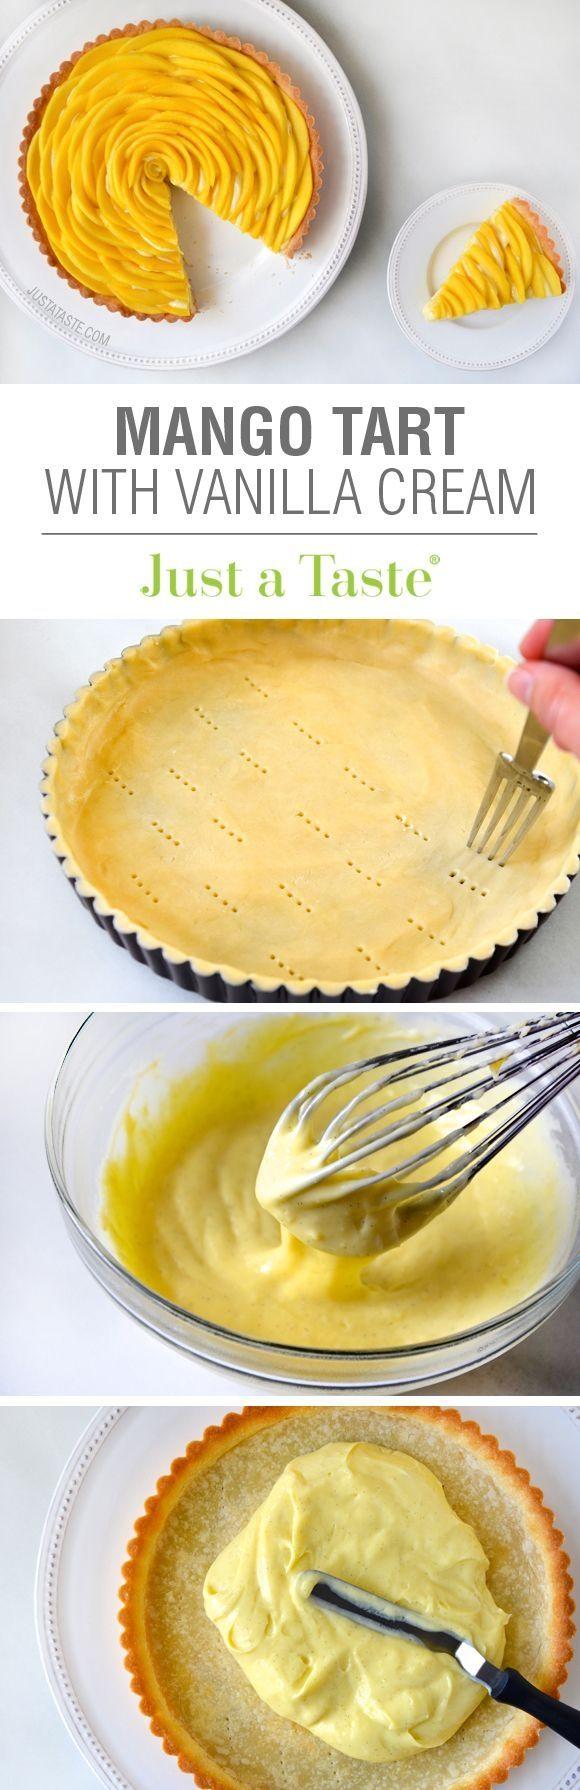 Mango Tart with Vanilla Bean Pastry Cream #recipe on justataste.com by Belen Balsera